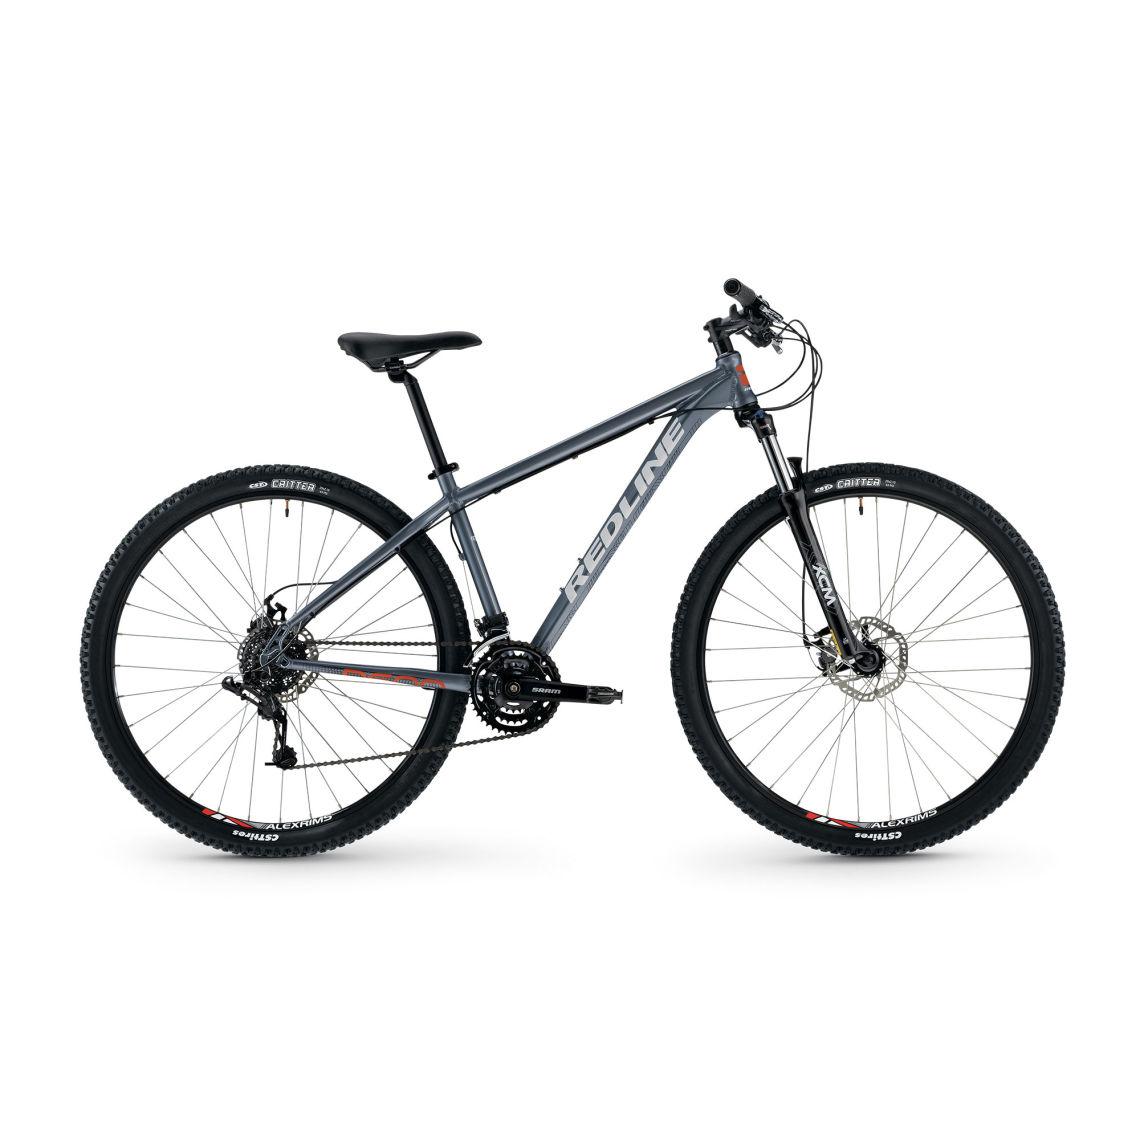 1140x1140 Redline D600 29er Mountain Bike Jerk's Bike Shop